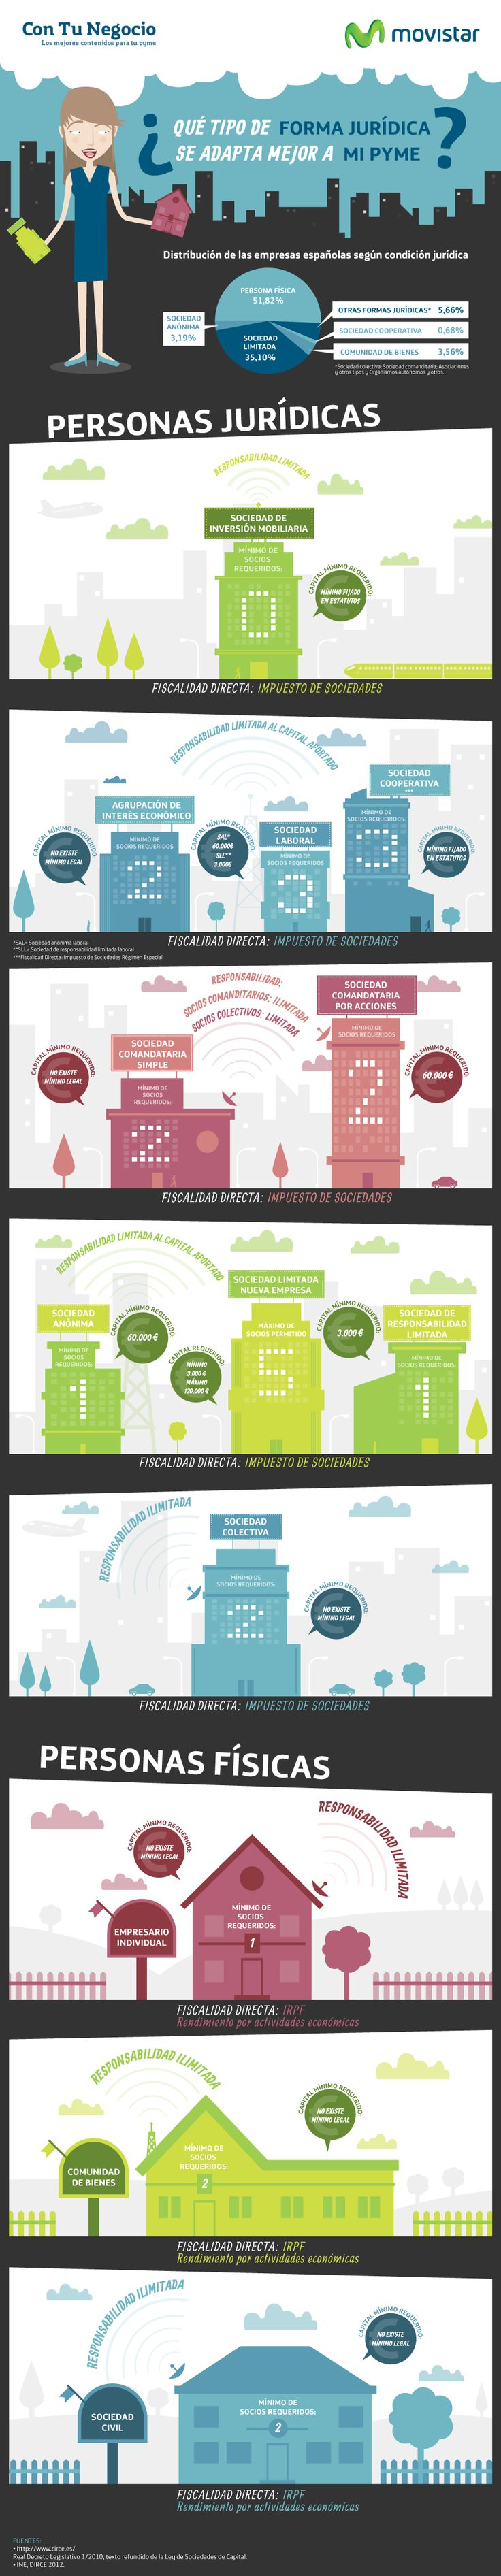 La mejor forma jurídica para tu pyme #infografia